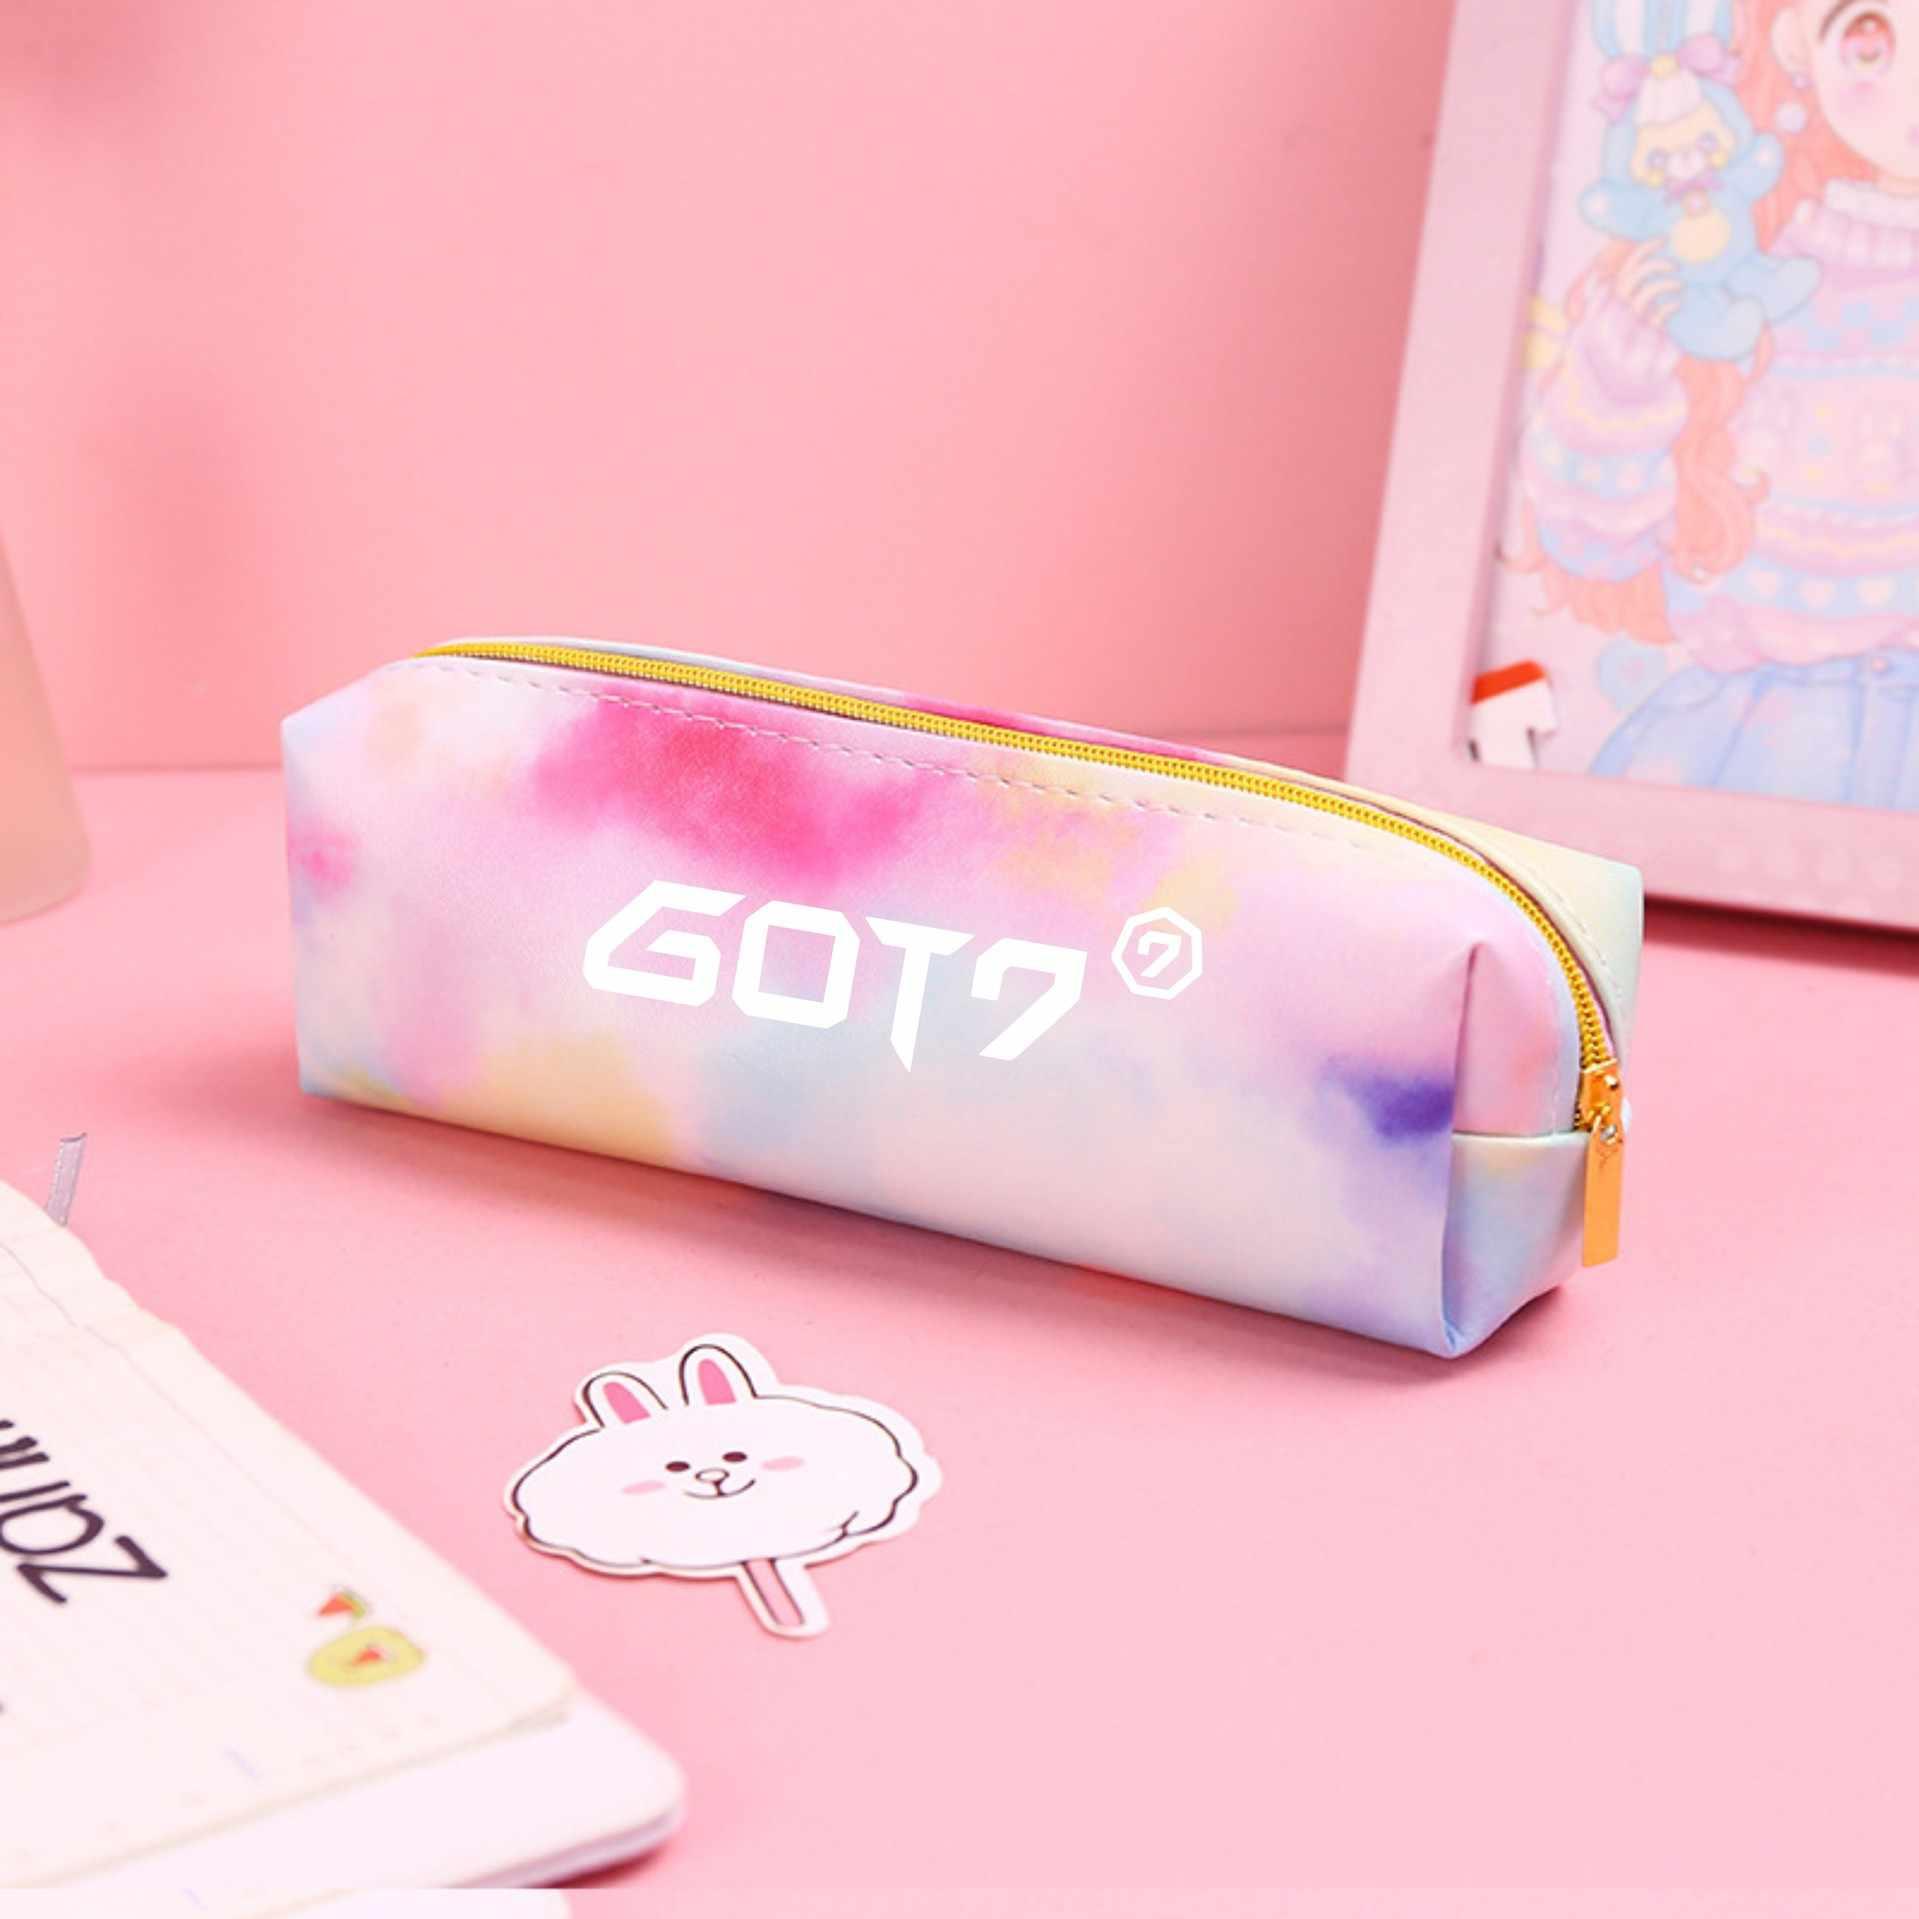 Kpop Exo dos veces Wannaone Got7 bolsa de lápiz de cuero caja de lápiz bolsa de maquillaje arcoíris bolsa de recepción cartera al por mayor nuevo